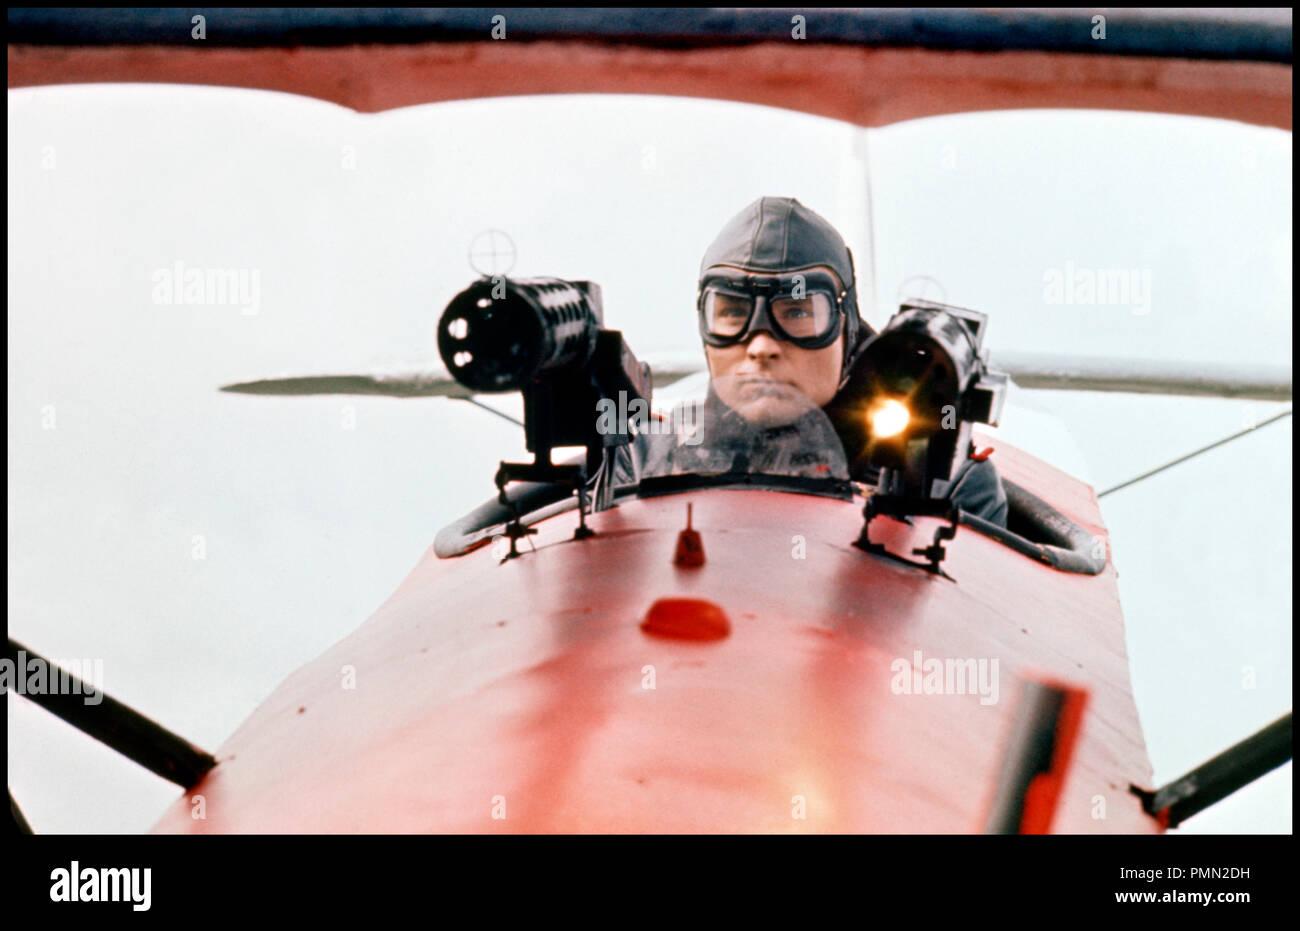 Prod DB © The Corman Company / DR LE BARON ROUGE (VON RICHTHOFEN AND BROWN / THE RED BARON) de Roger Corman 1971 USA John Phillip Law biographie, aviation WW I, guerre, uniforme, aviateur, mitrailleuse, combat aerien - Stock Image